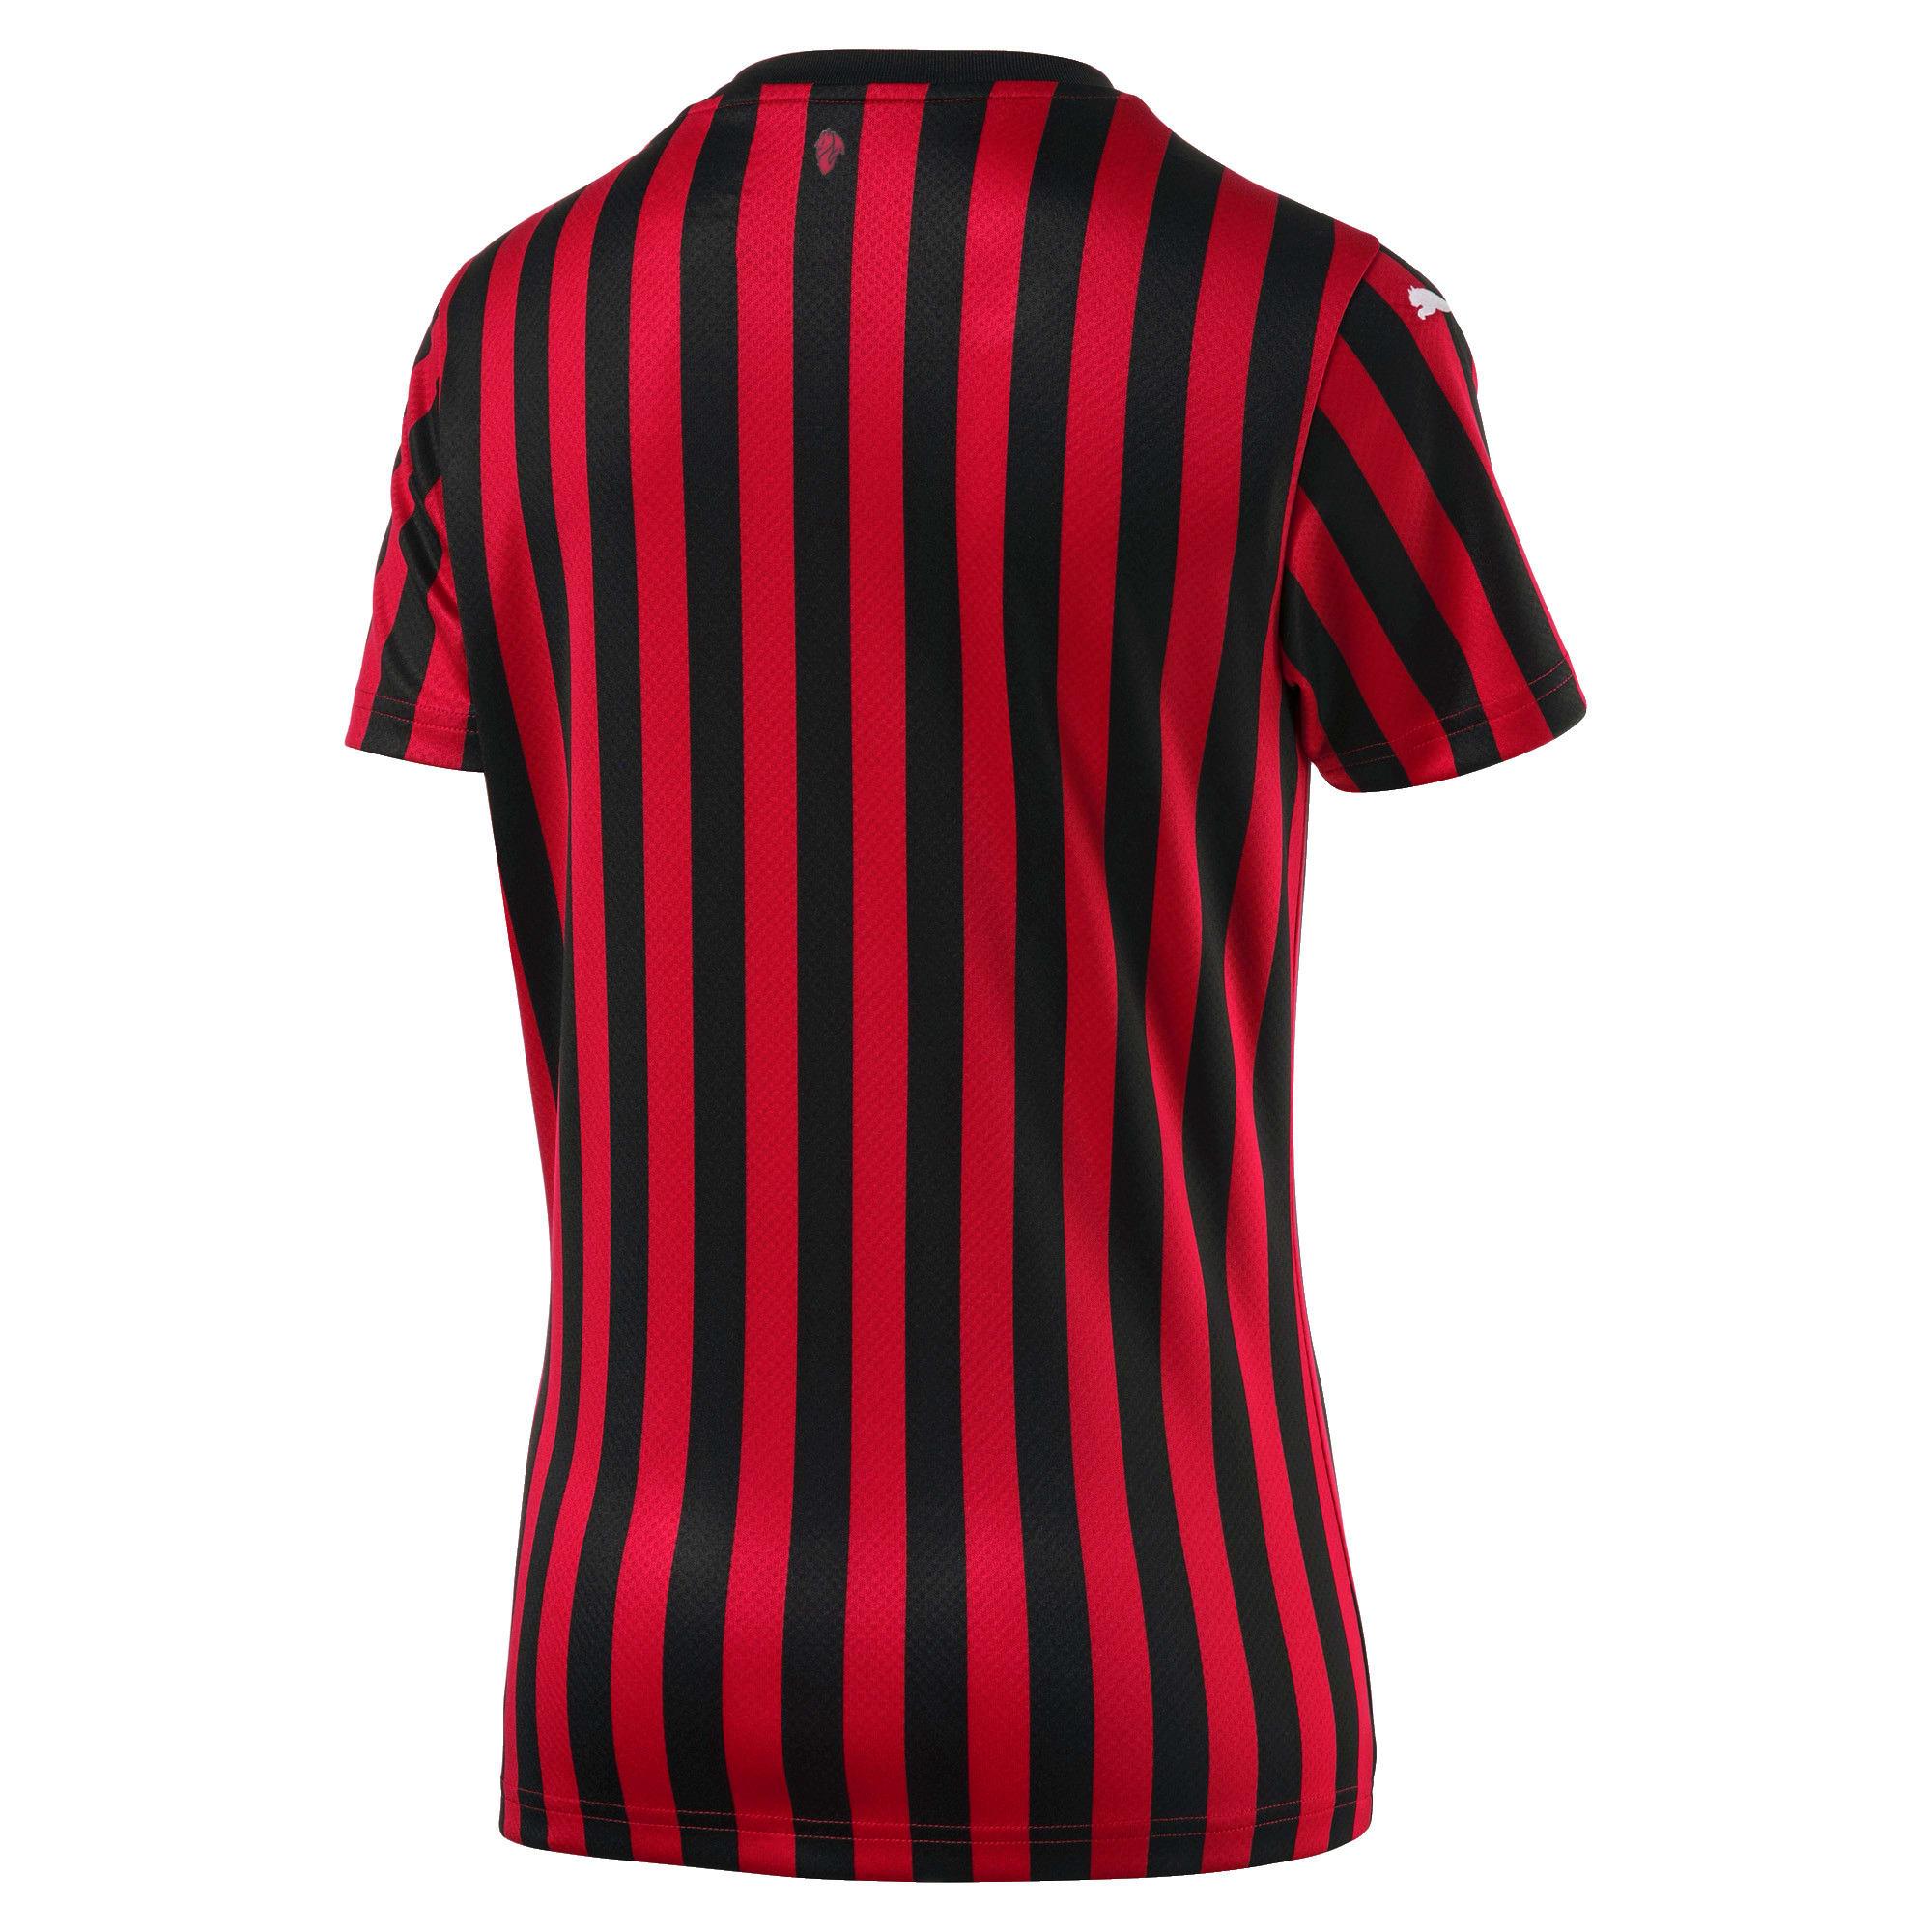 Thumbnail 2 of AC Milan Home Replica Short Sleeve Women's Jersey, Tango Red -Puma Black, medium